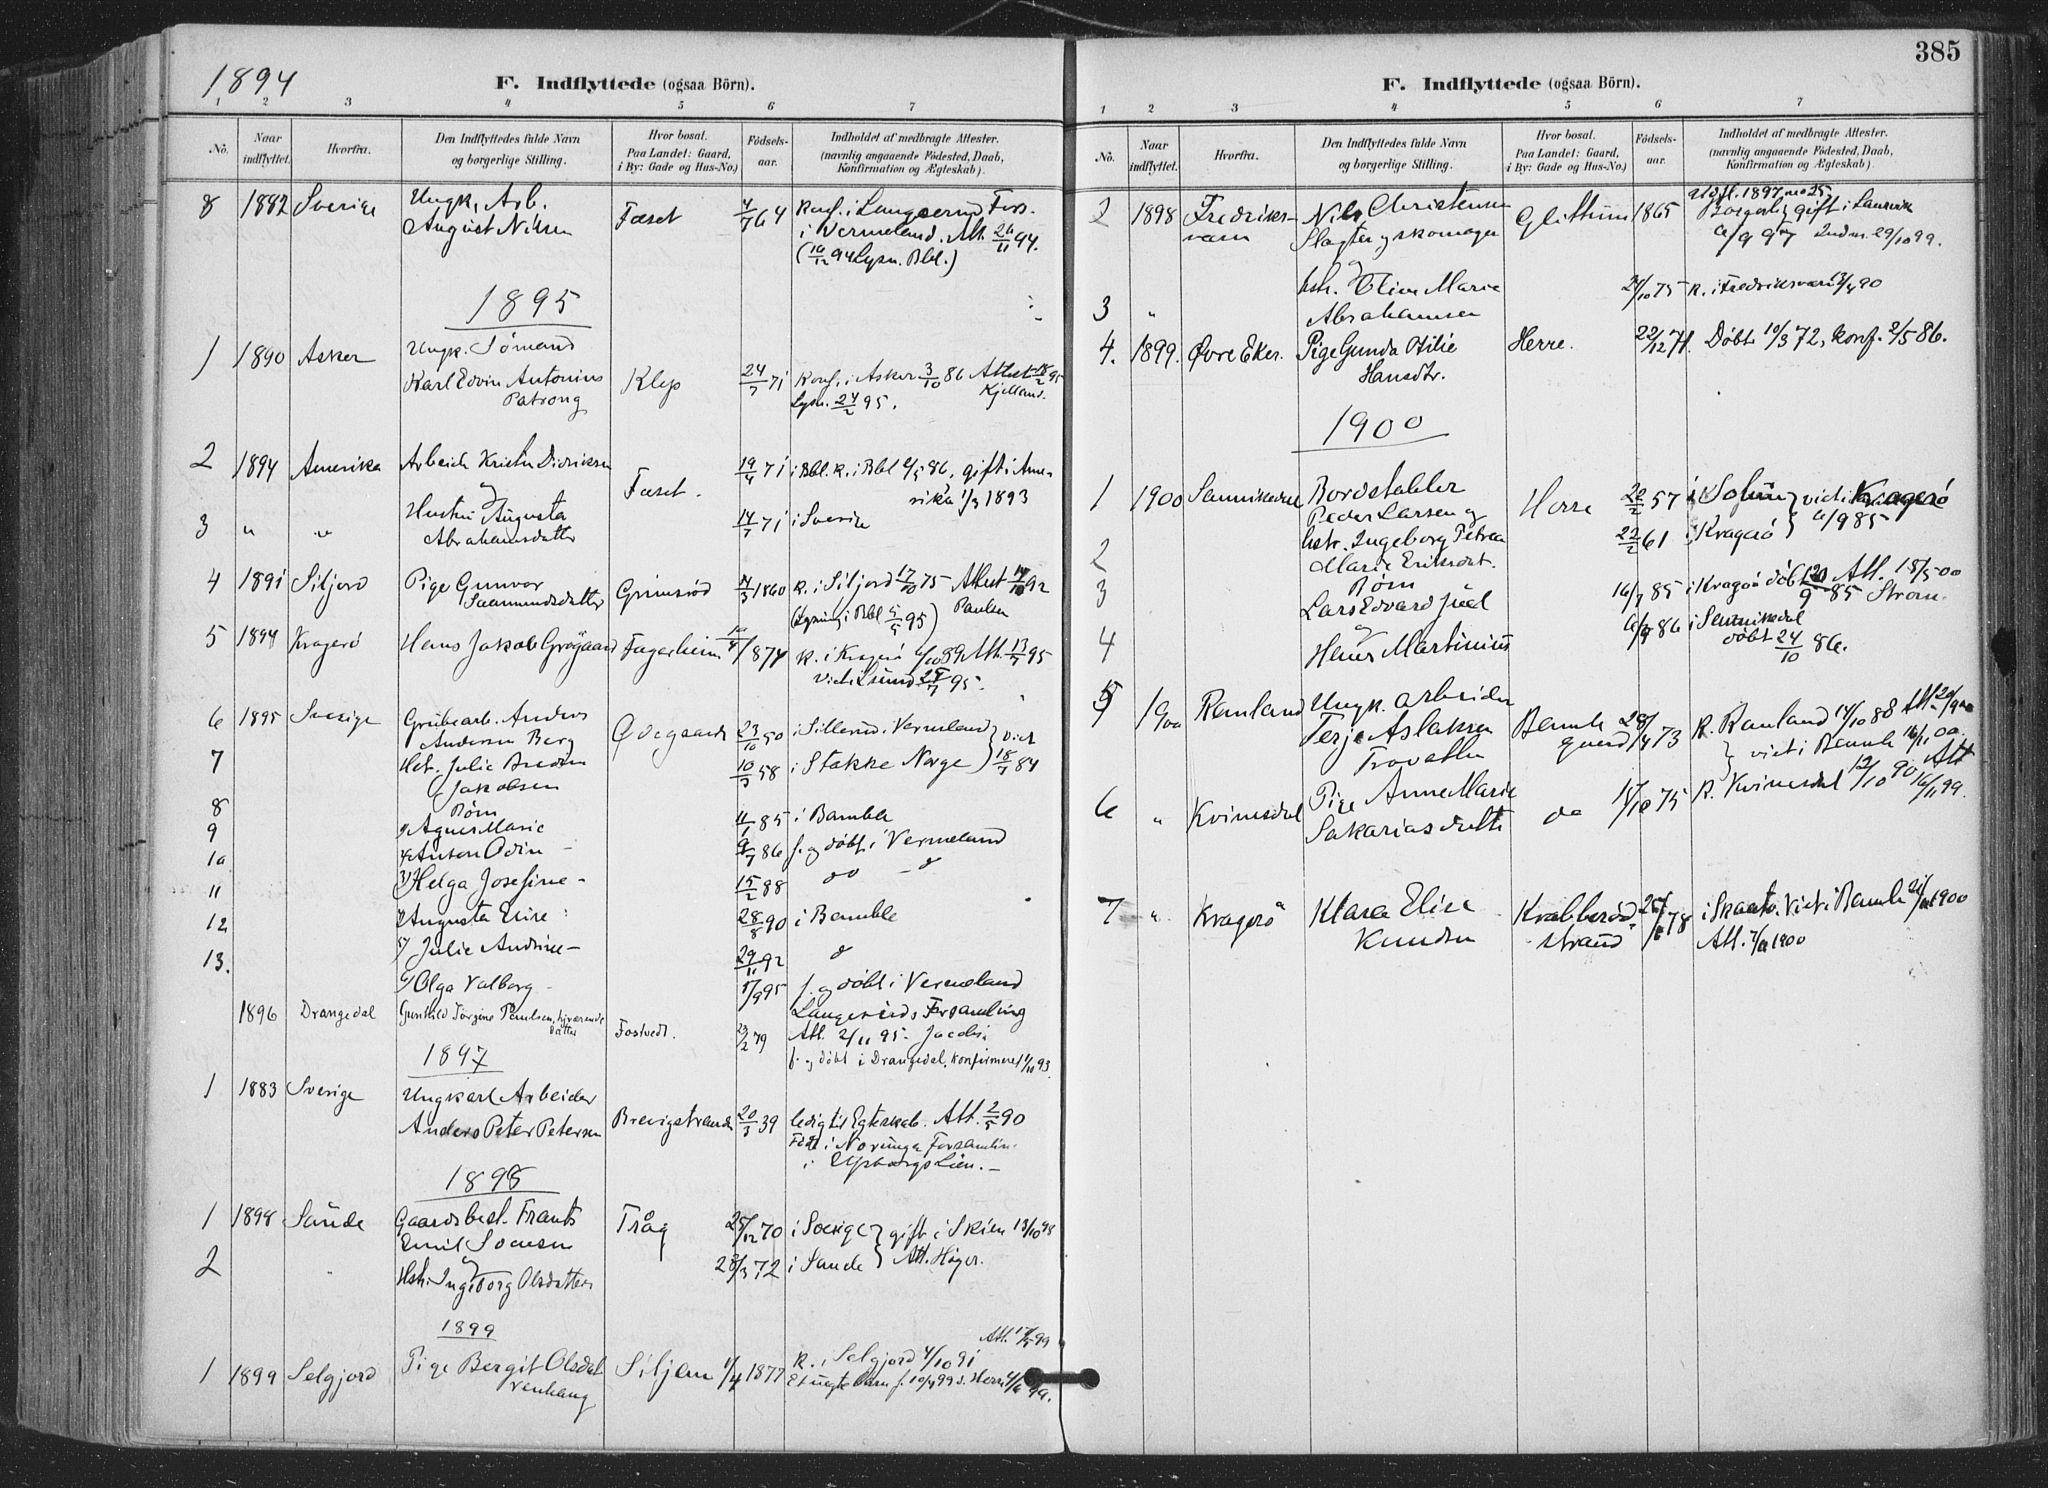 SAKO, Bamble kirkebøker, F/Fa/L0008: Ministerialbok nr. I 8, 1888-1900, s. 385